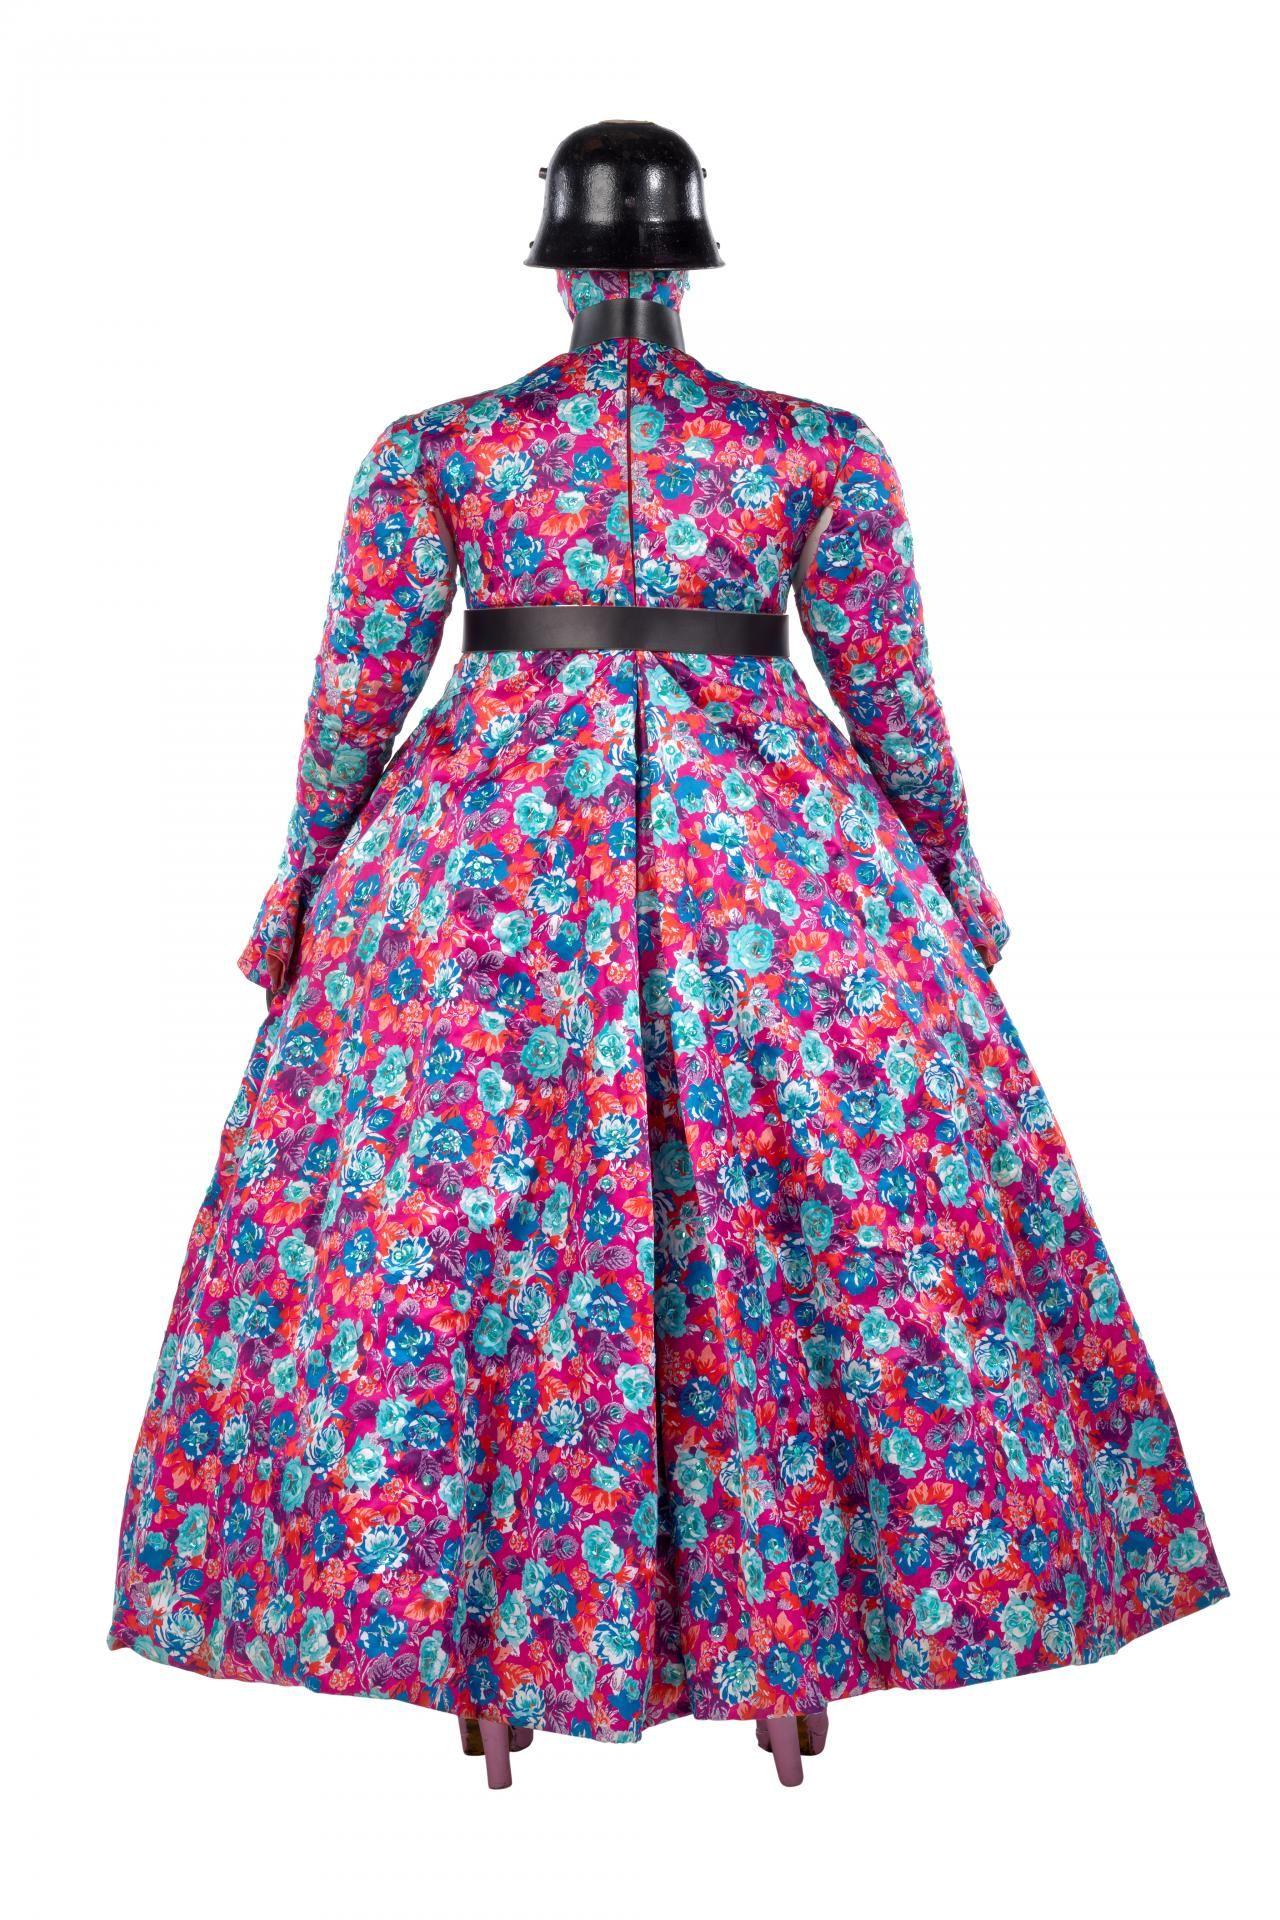 Avant Garde Clothing Australia